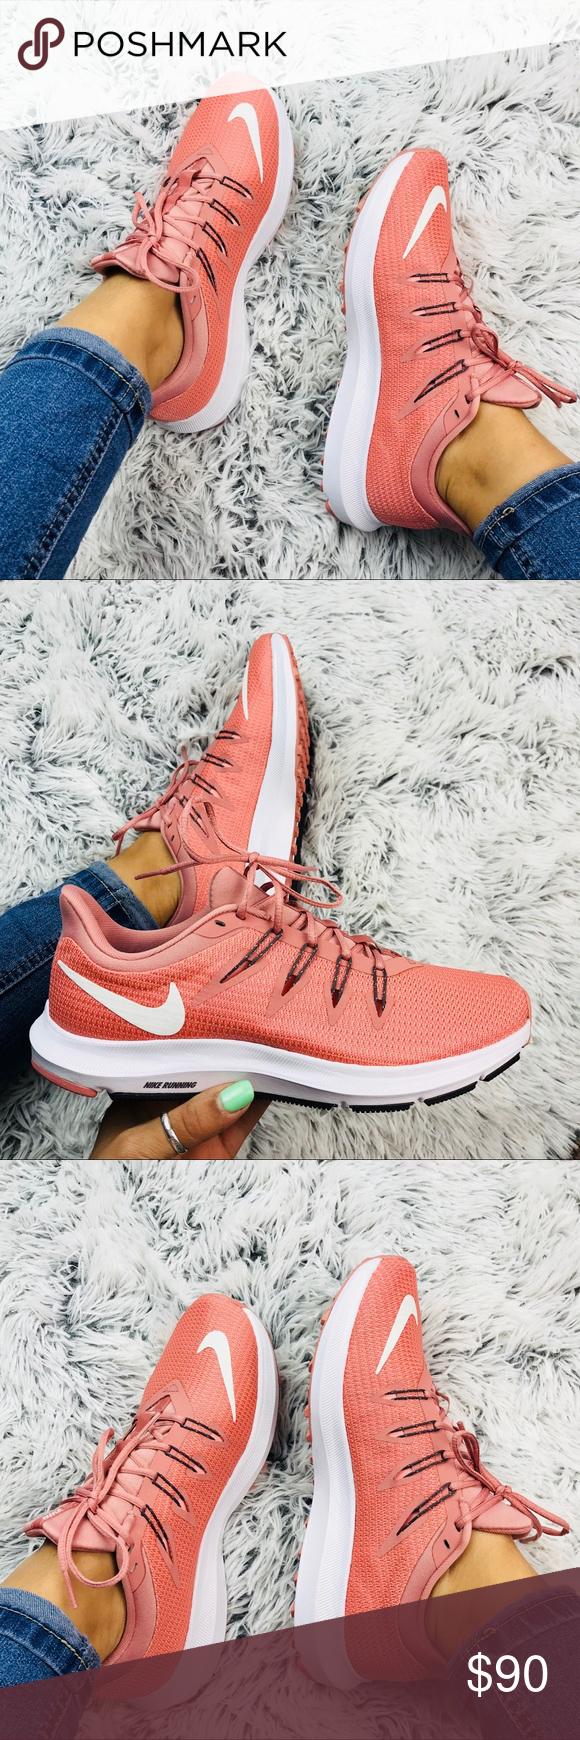 Women's Nike Quest Trainers | Nike